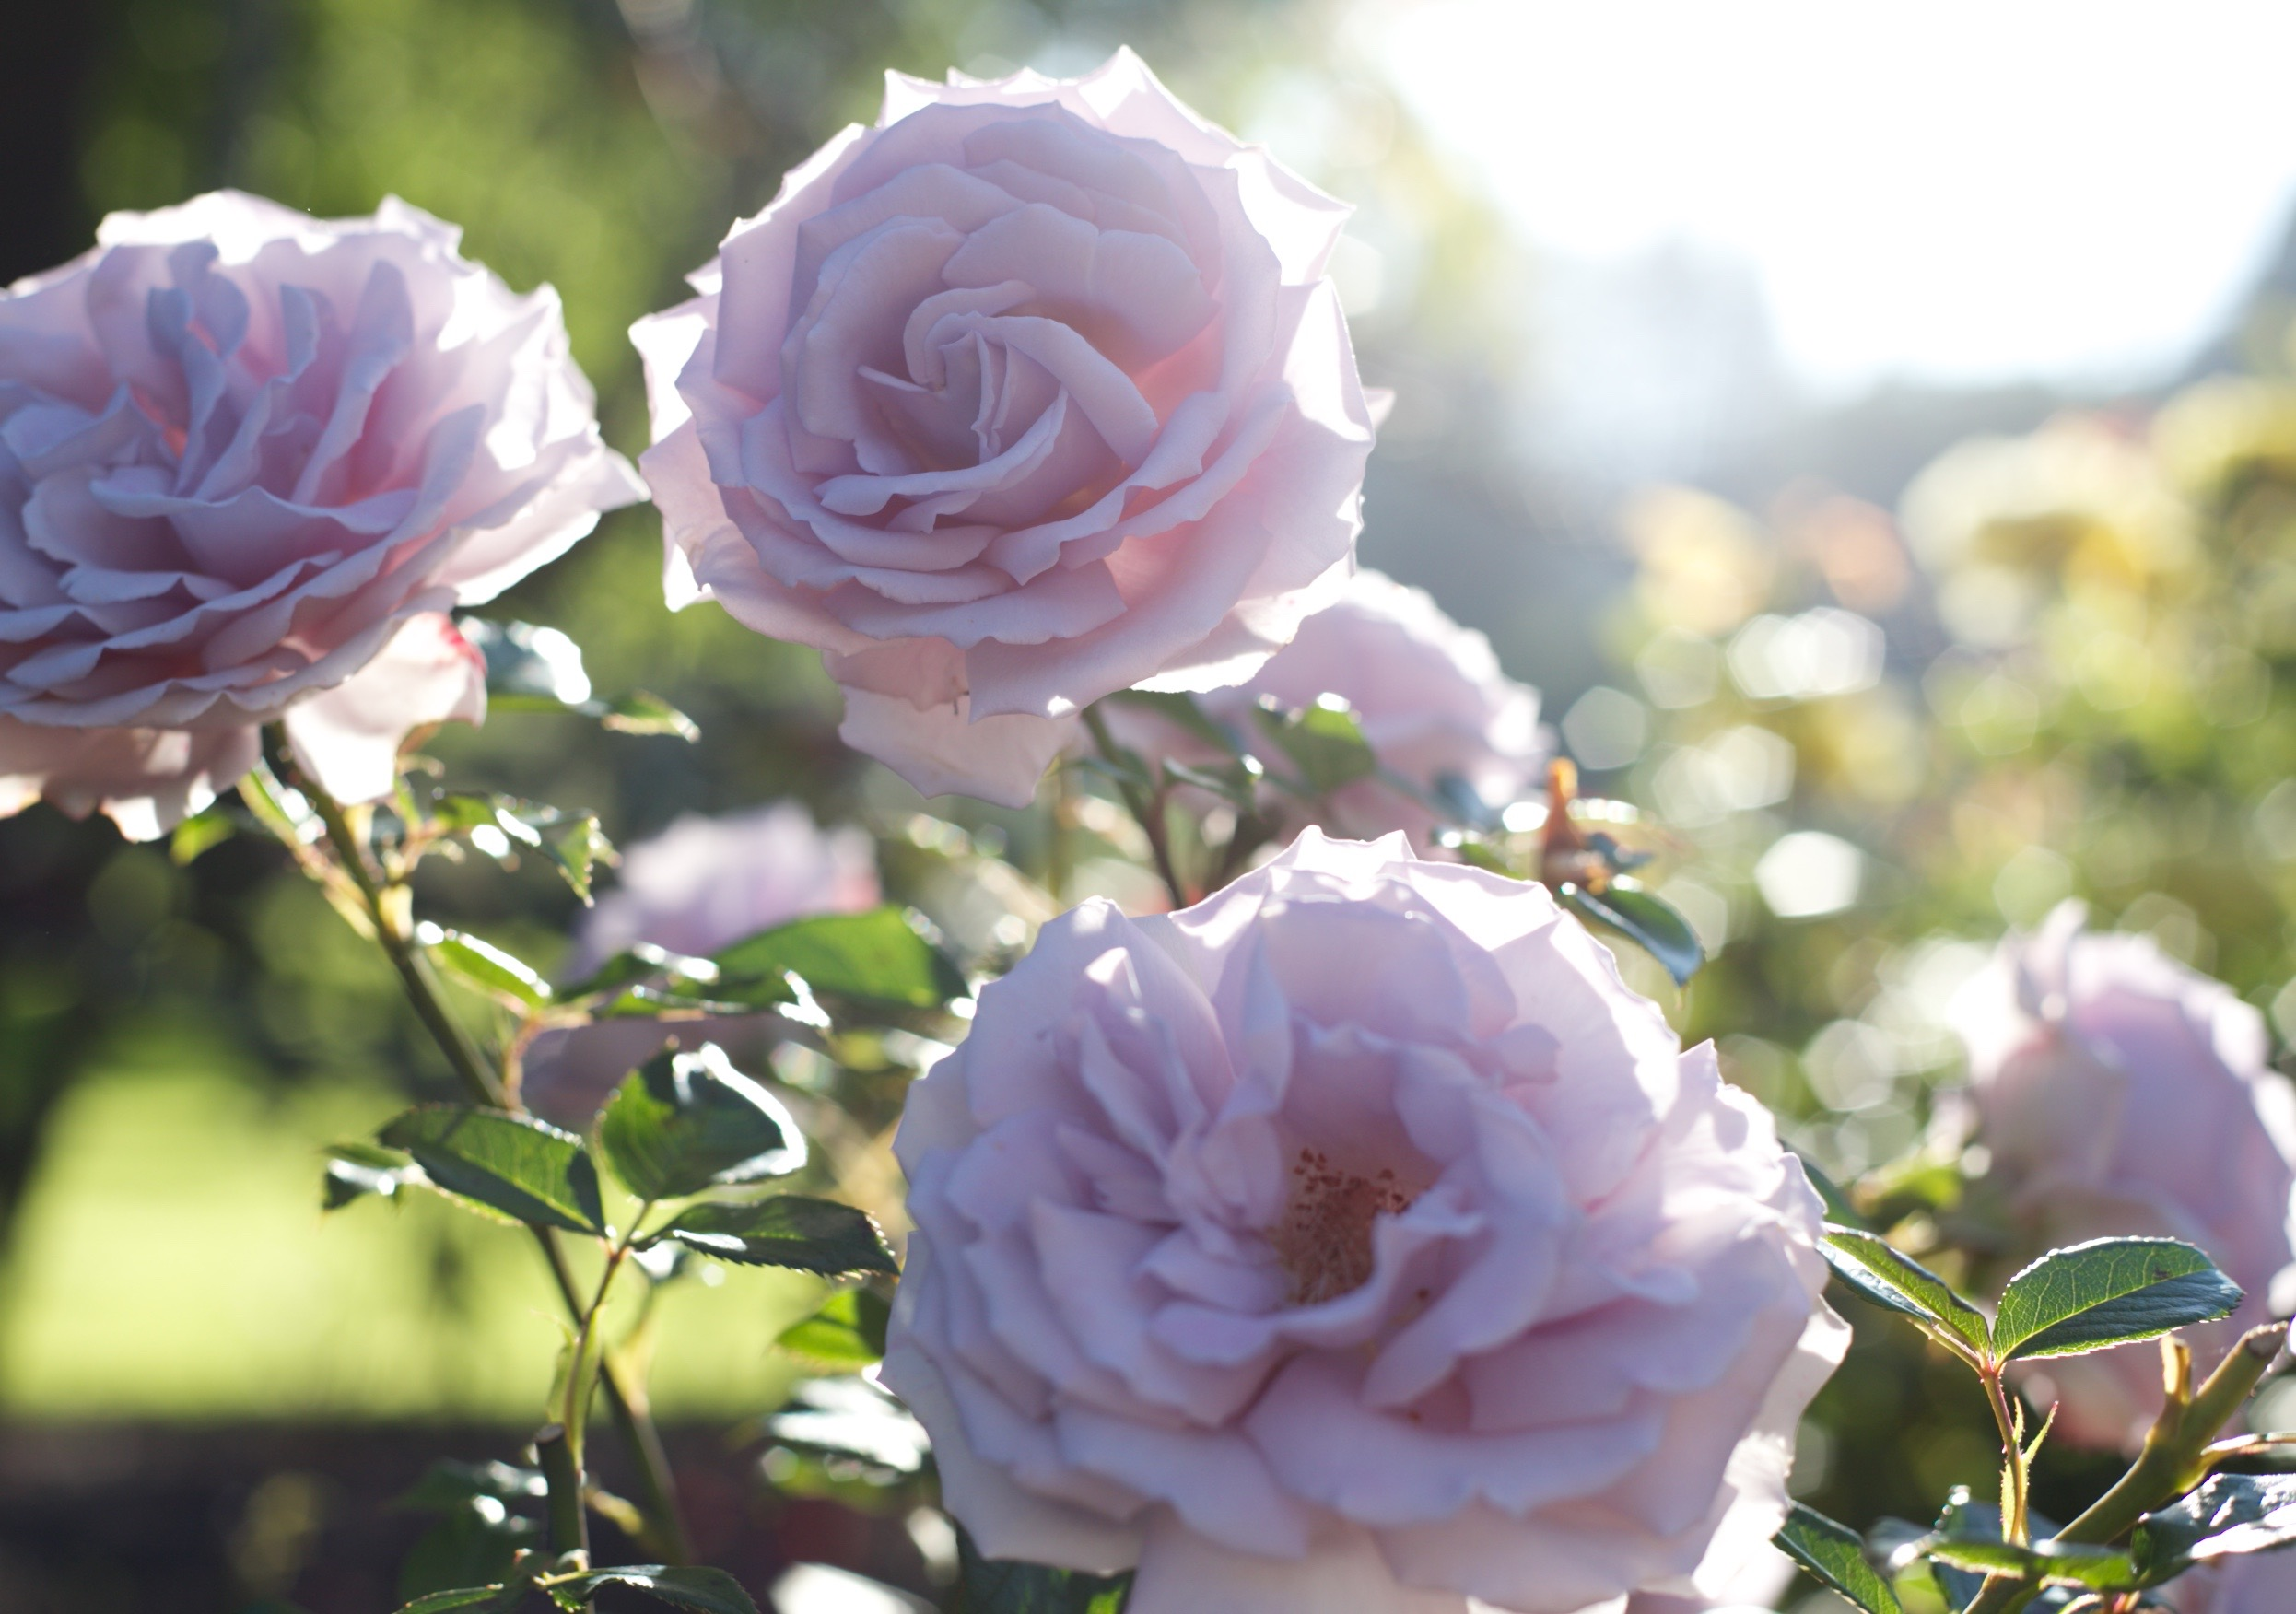 dusky purple roses in the morning light